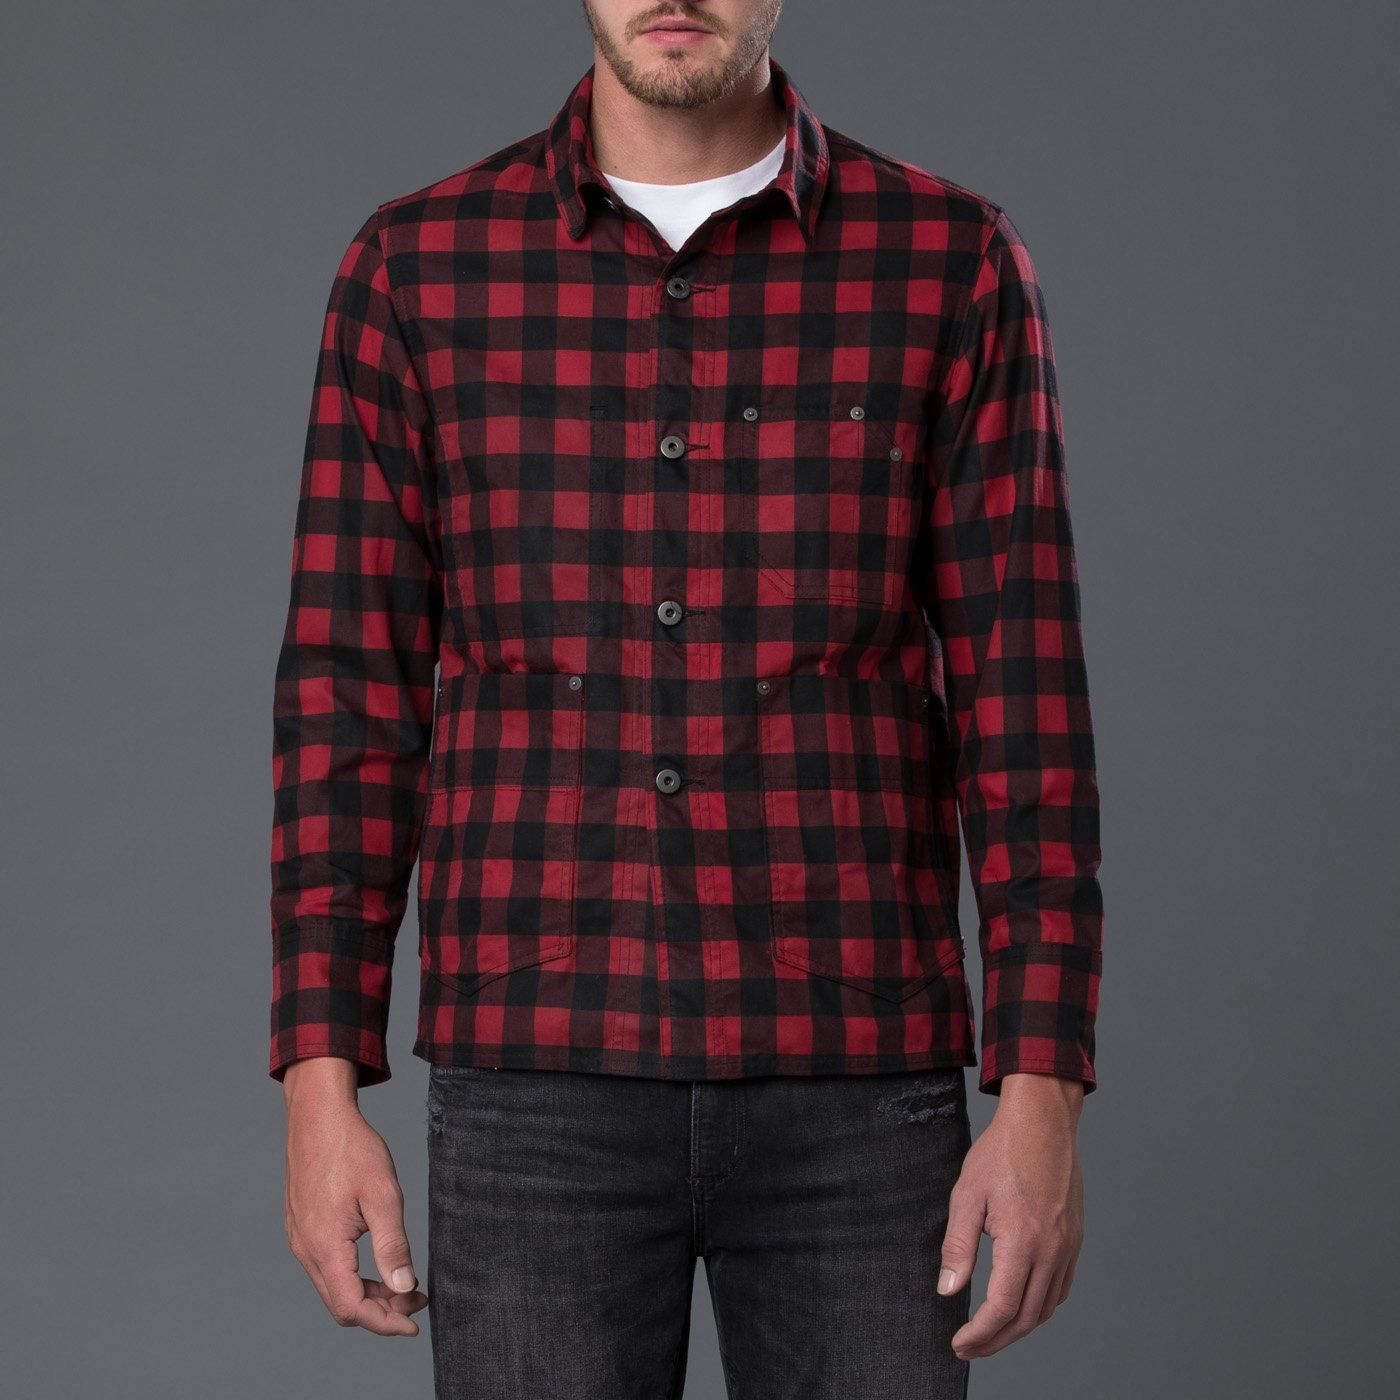 Red Plaid Waxed Cotton Chore Jacket Chore jacket